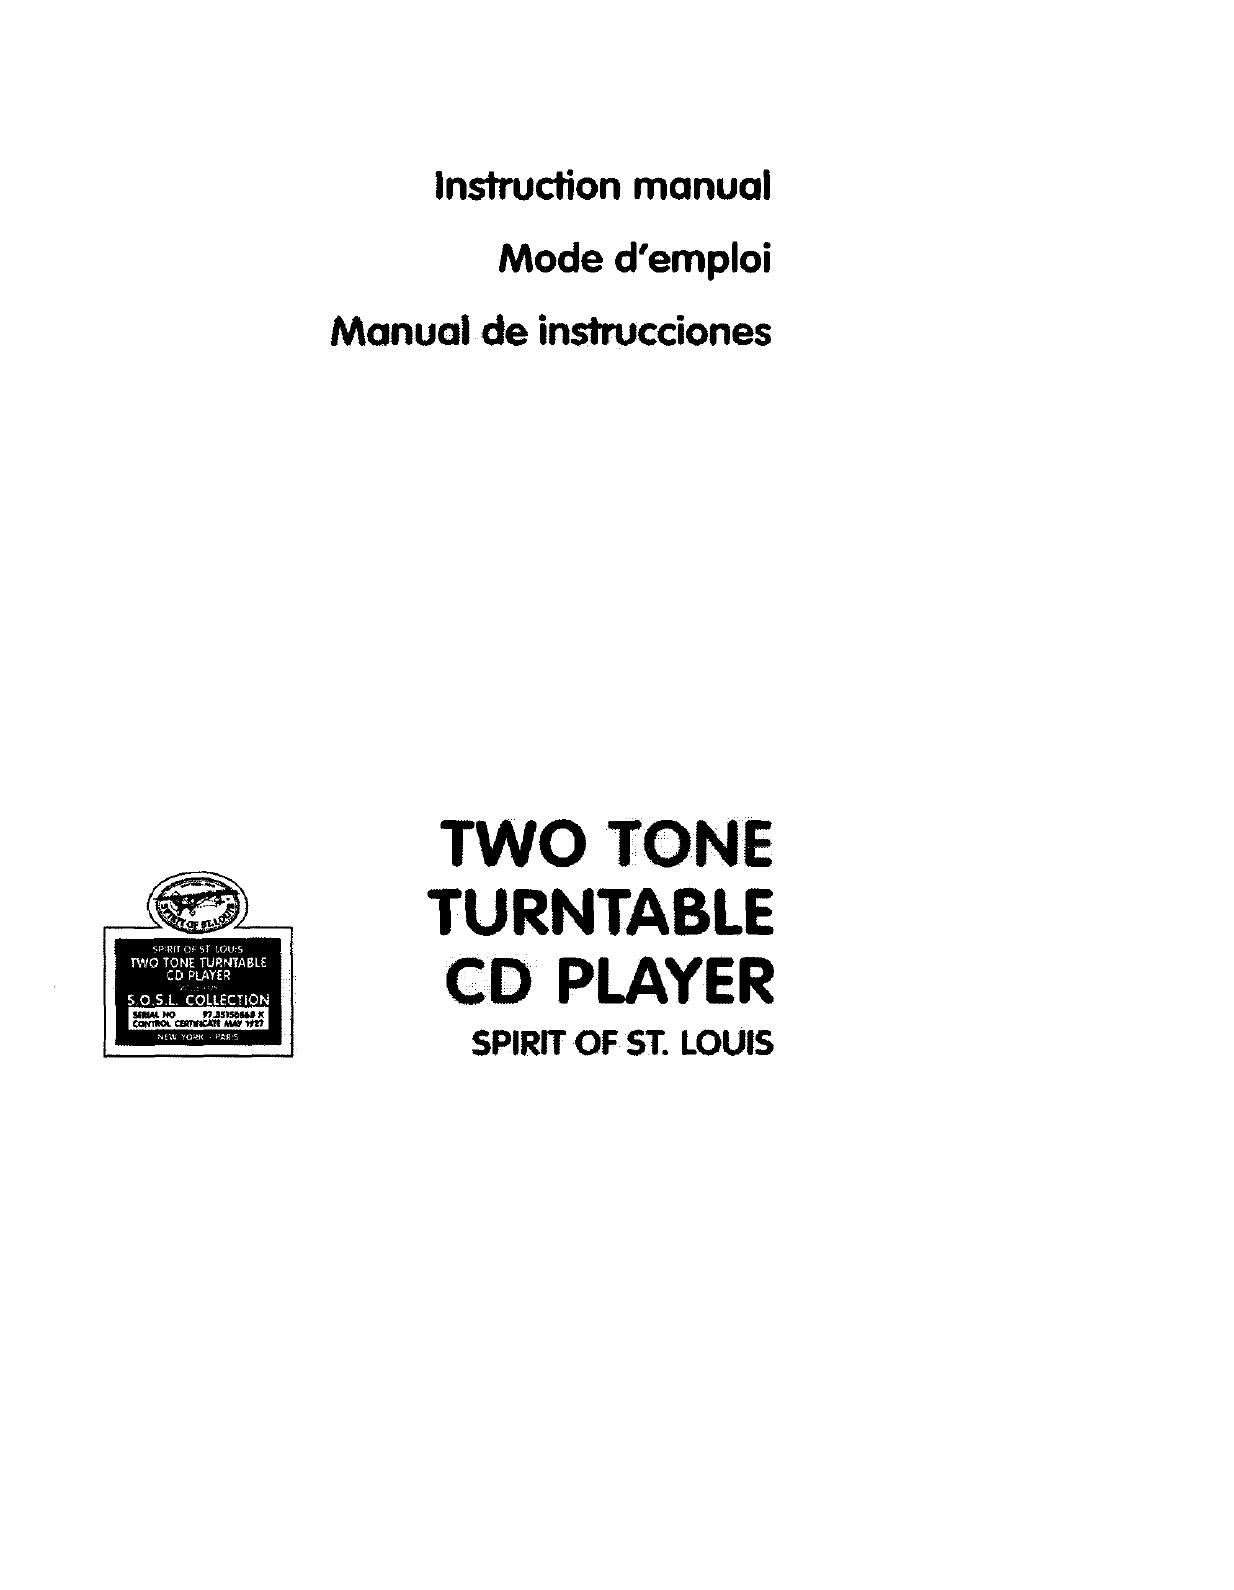 Spirit Of St Louis 841305 User Manual CD PLAYER Manuals